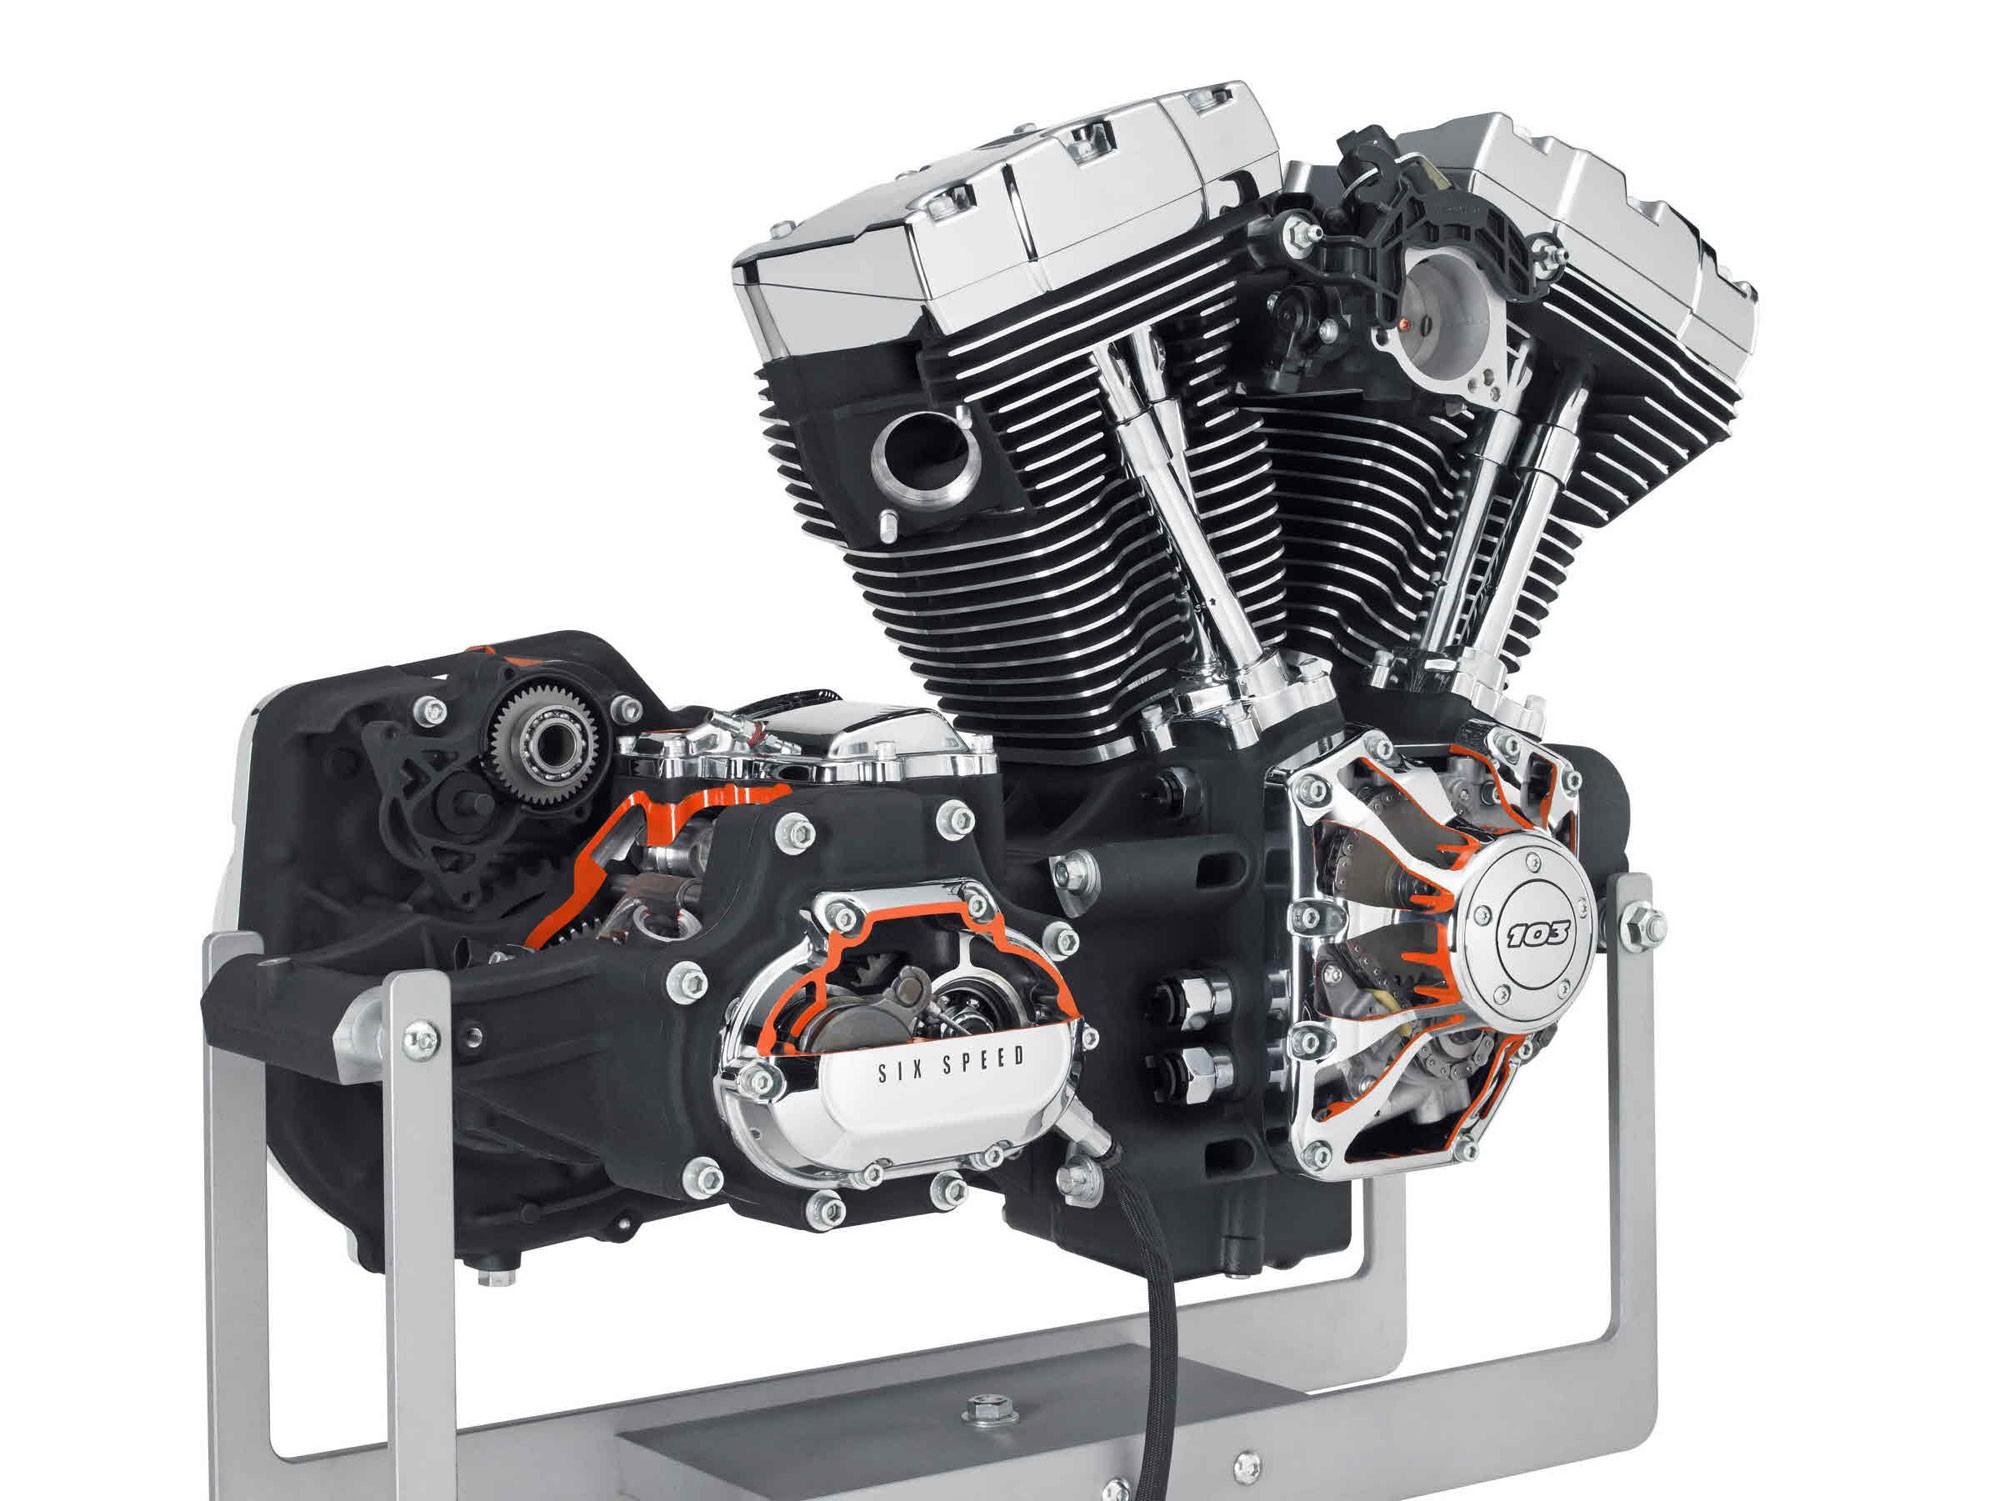 Harley Davidson 103 Engine Diagram Harley Evolution Engine Diagram Books Wiring Diagram •